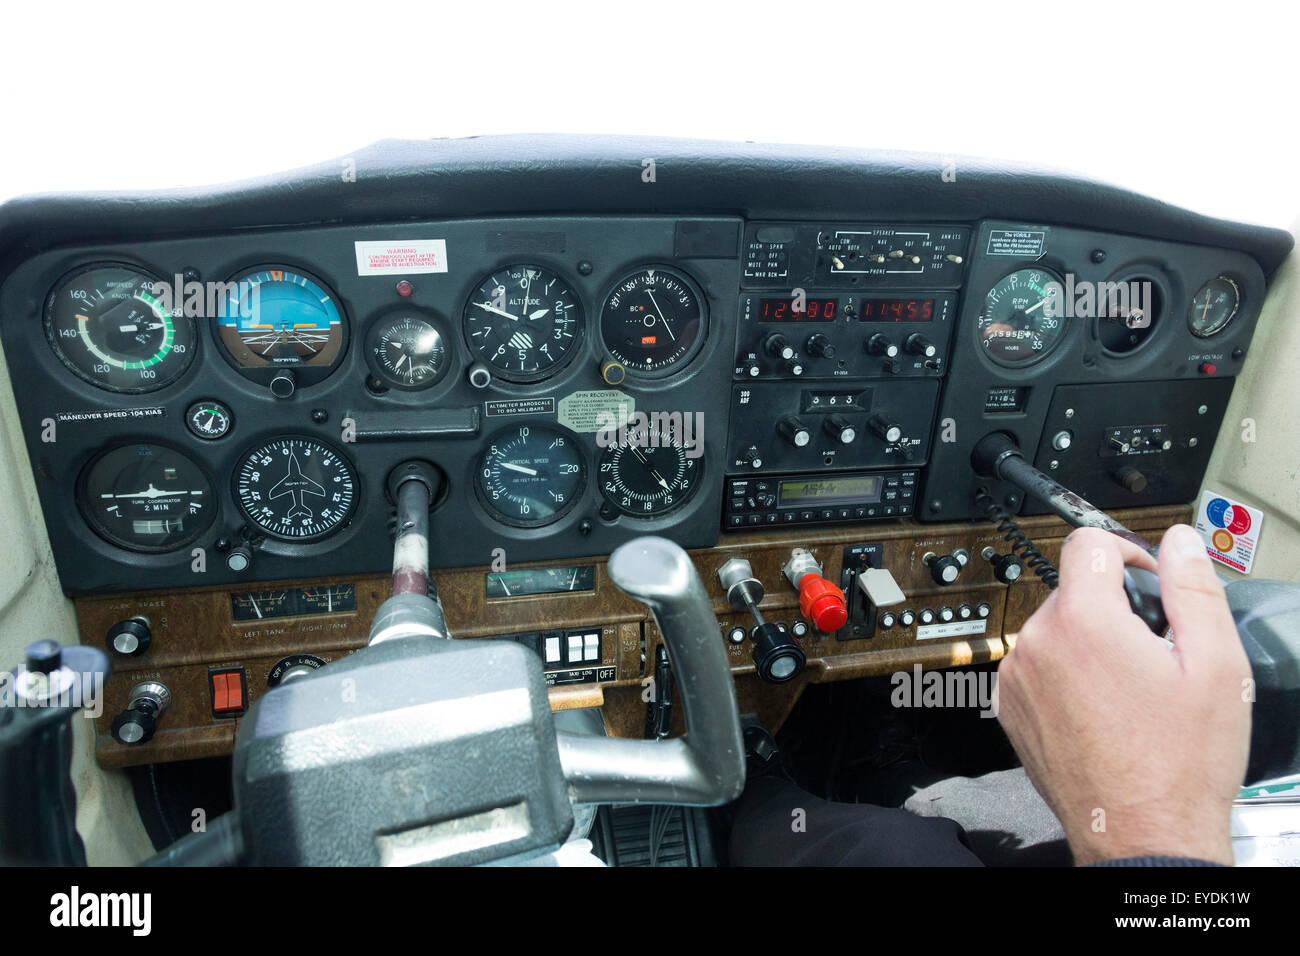 cockpit instrument panel of a Cessna 152 light aircraft - Stock Image